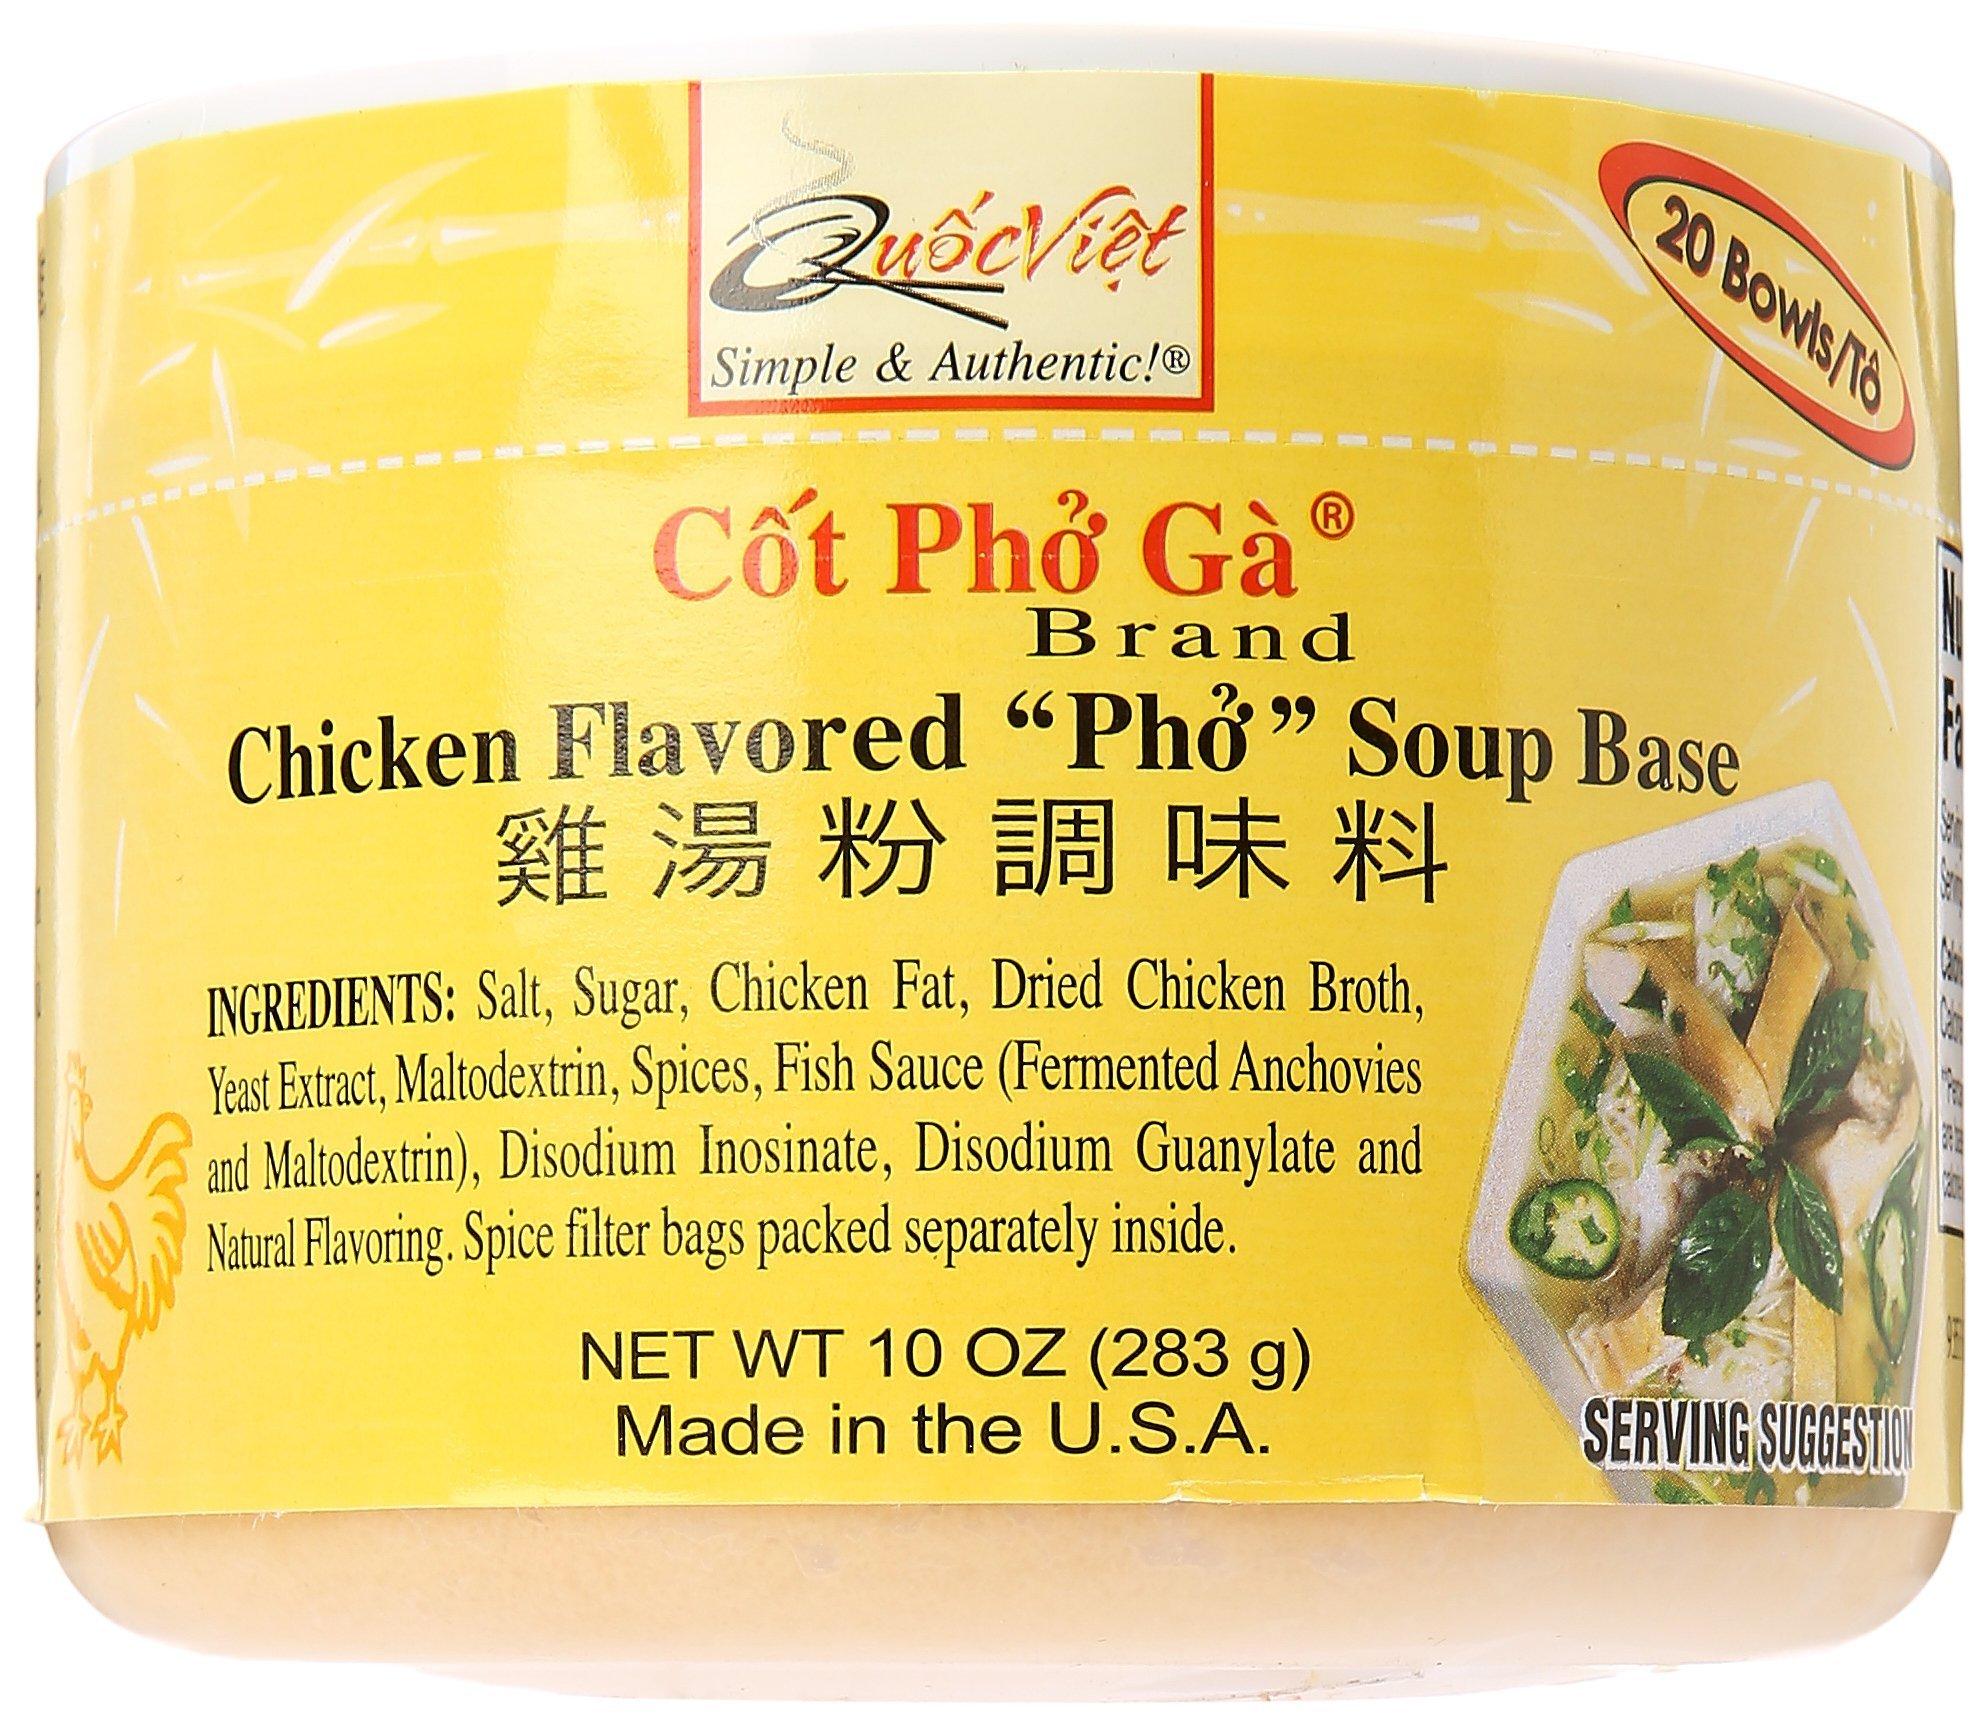 10oz Quoc Viet Foods Chicken Flavored Pho Soup Base (Cot Pho Ga) - One de87182aede